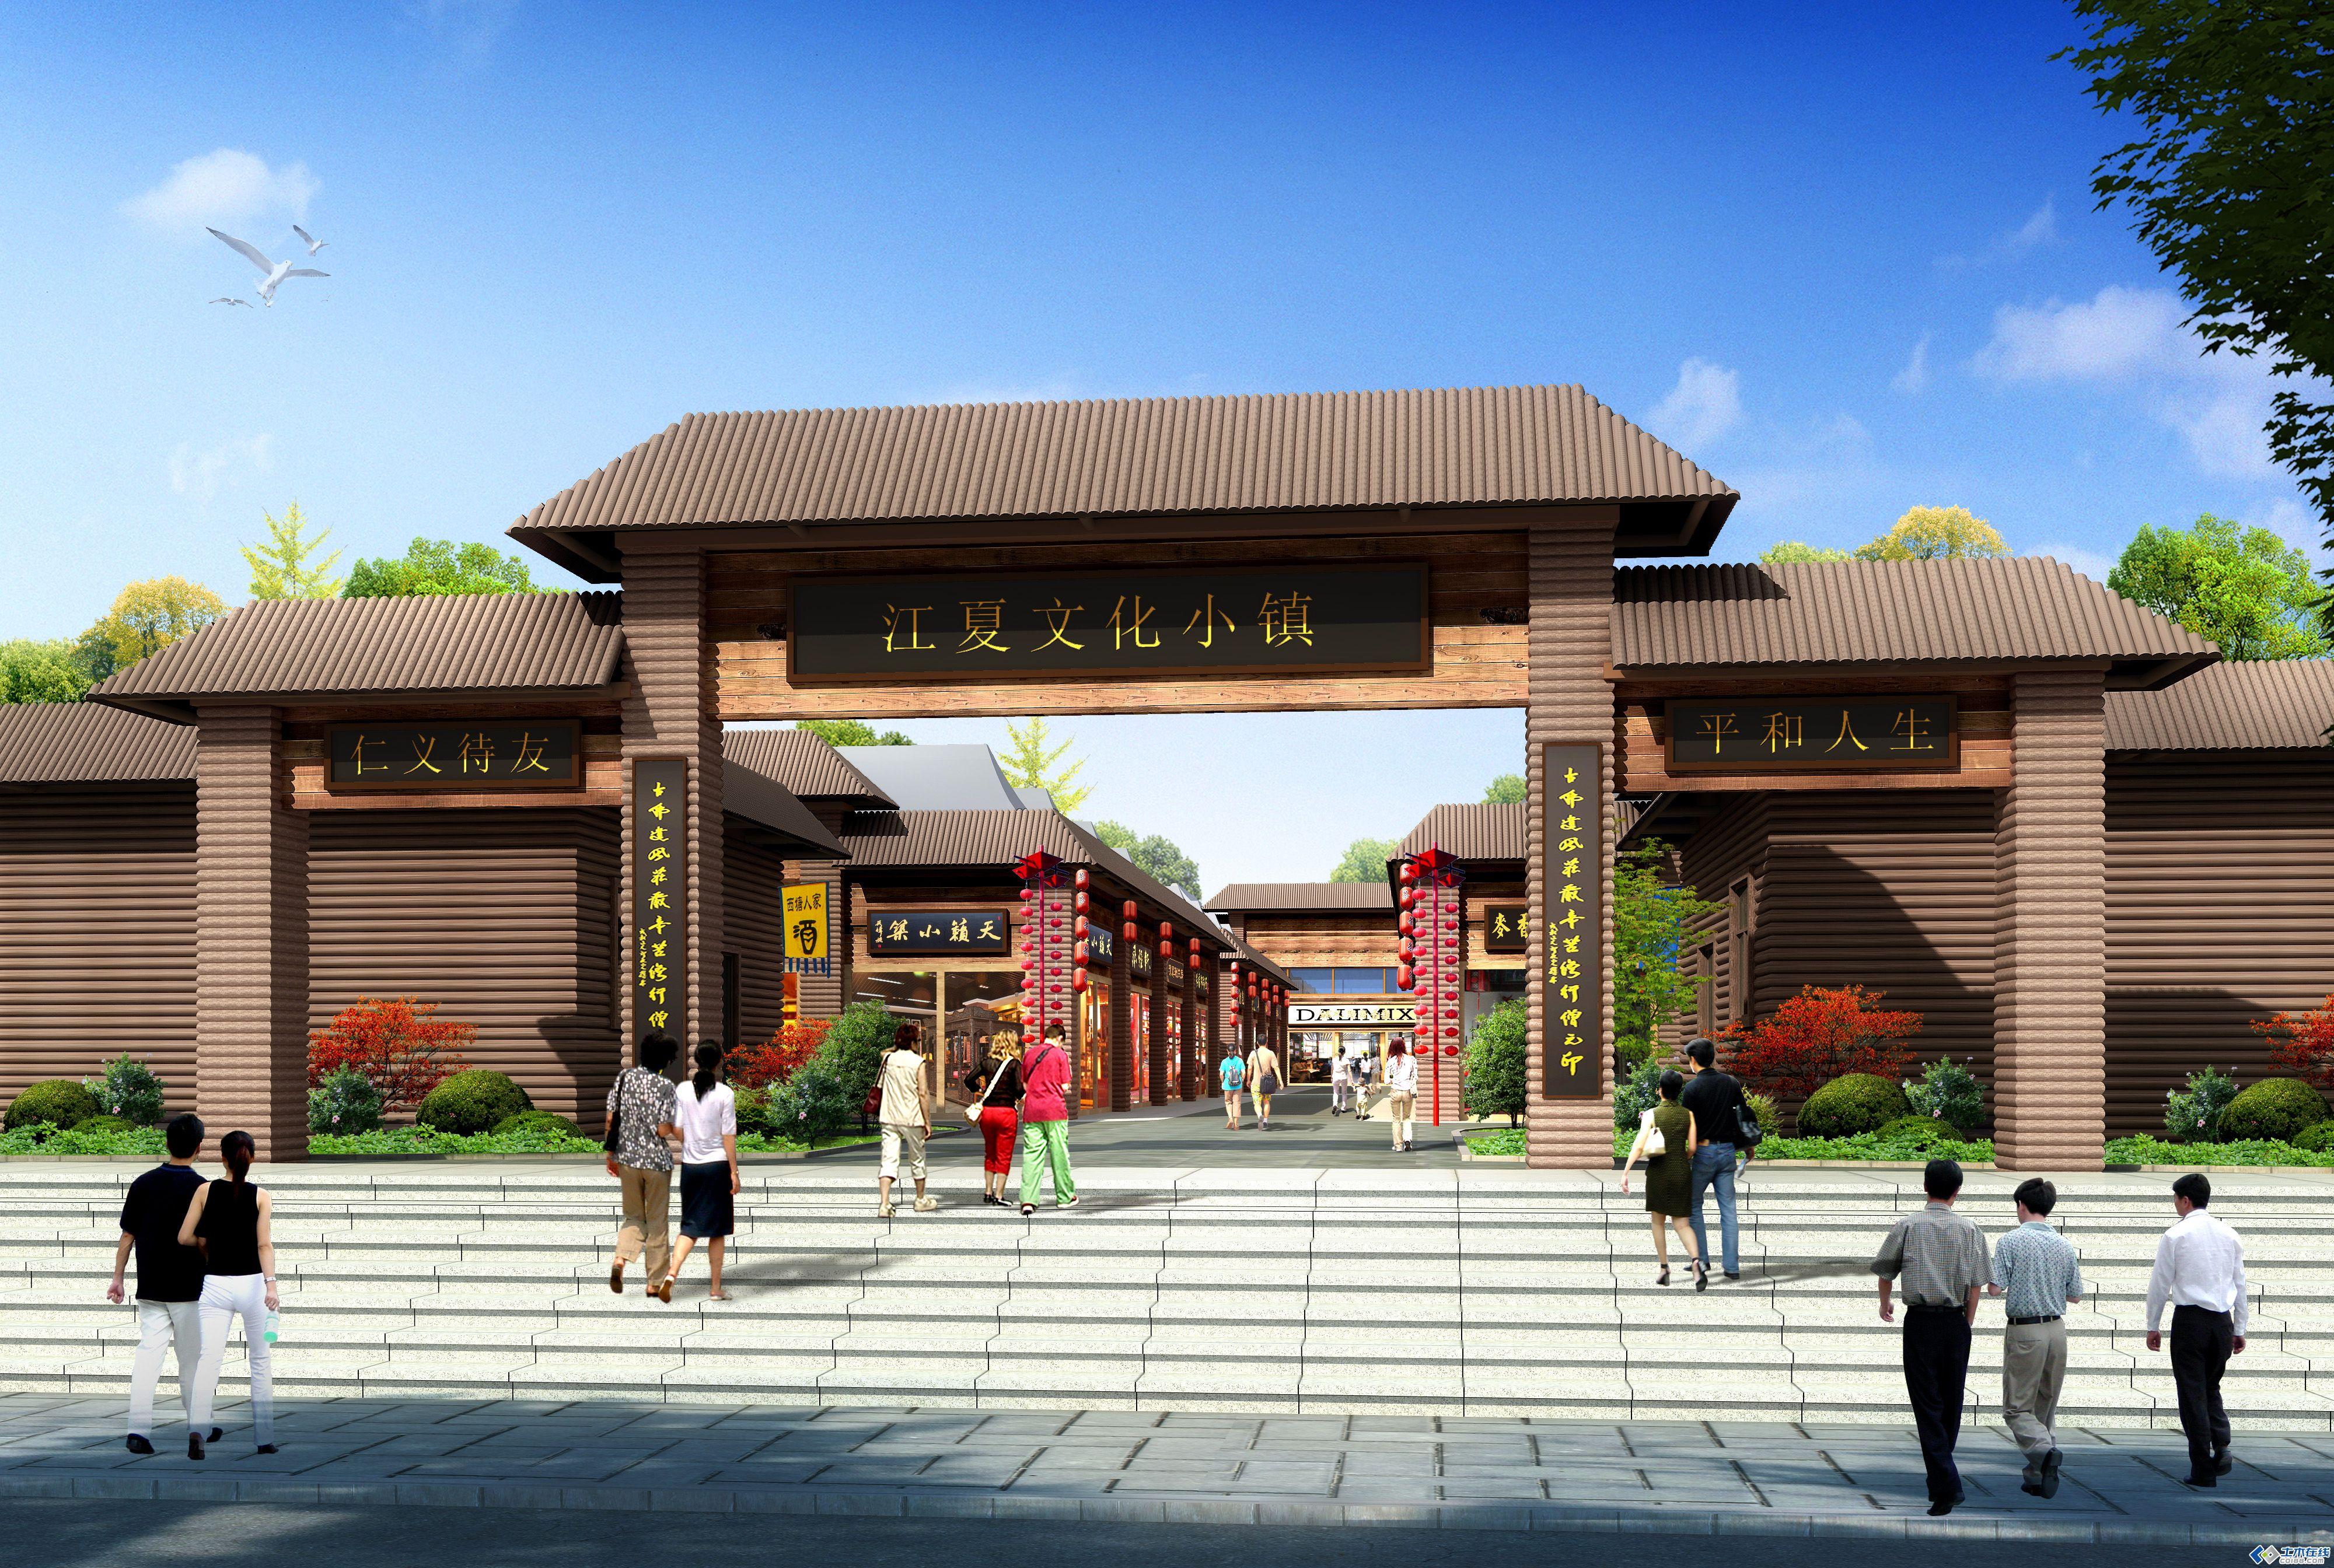 140904-tyf-和平文化小镇(兰海).jpg